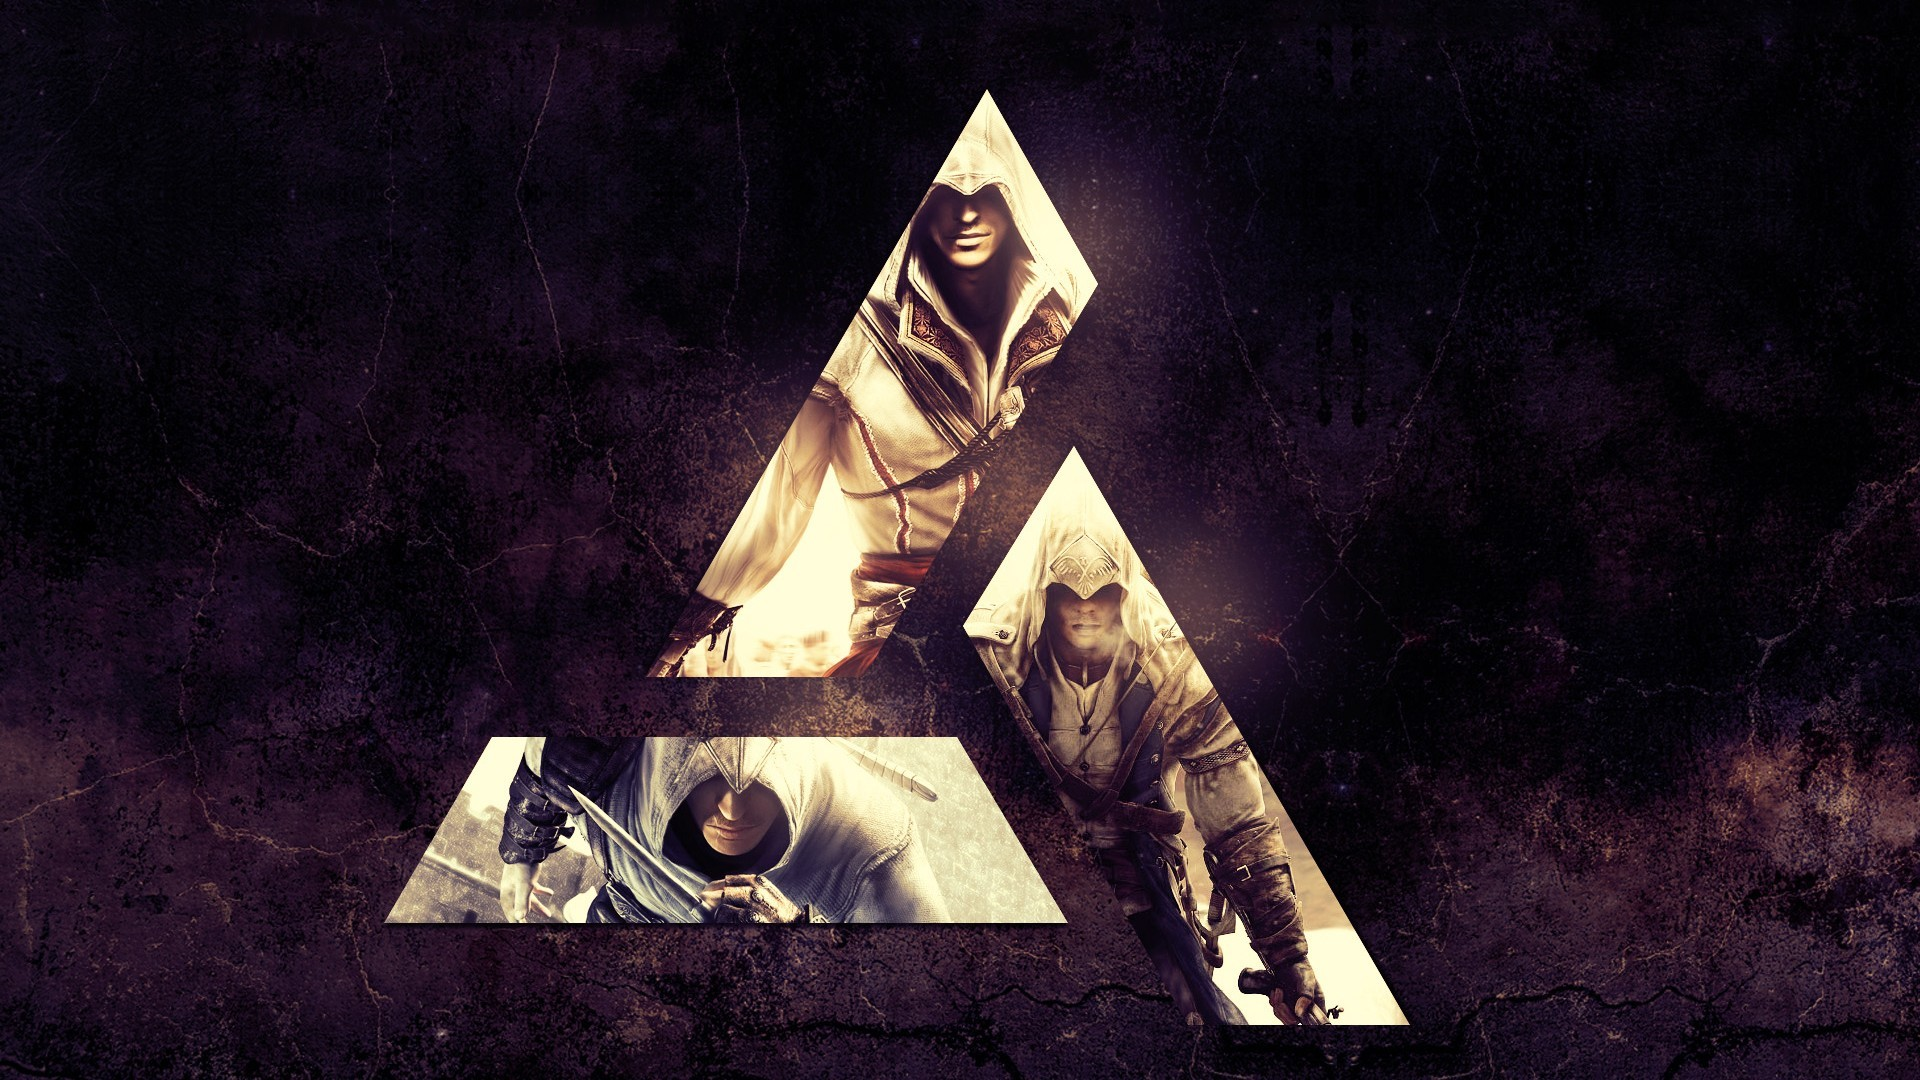 Assassins Creed III Graphic Desktop Wallpaper